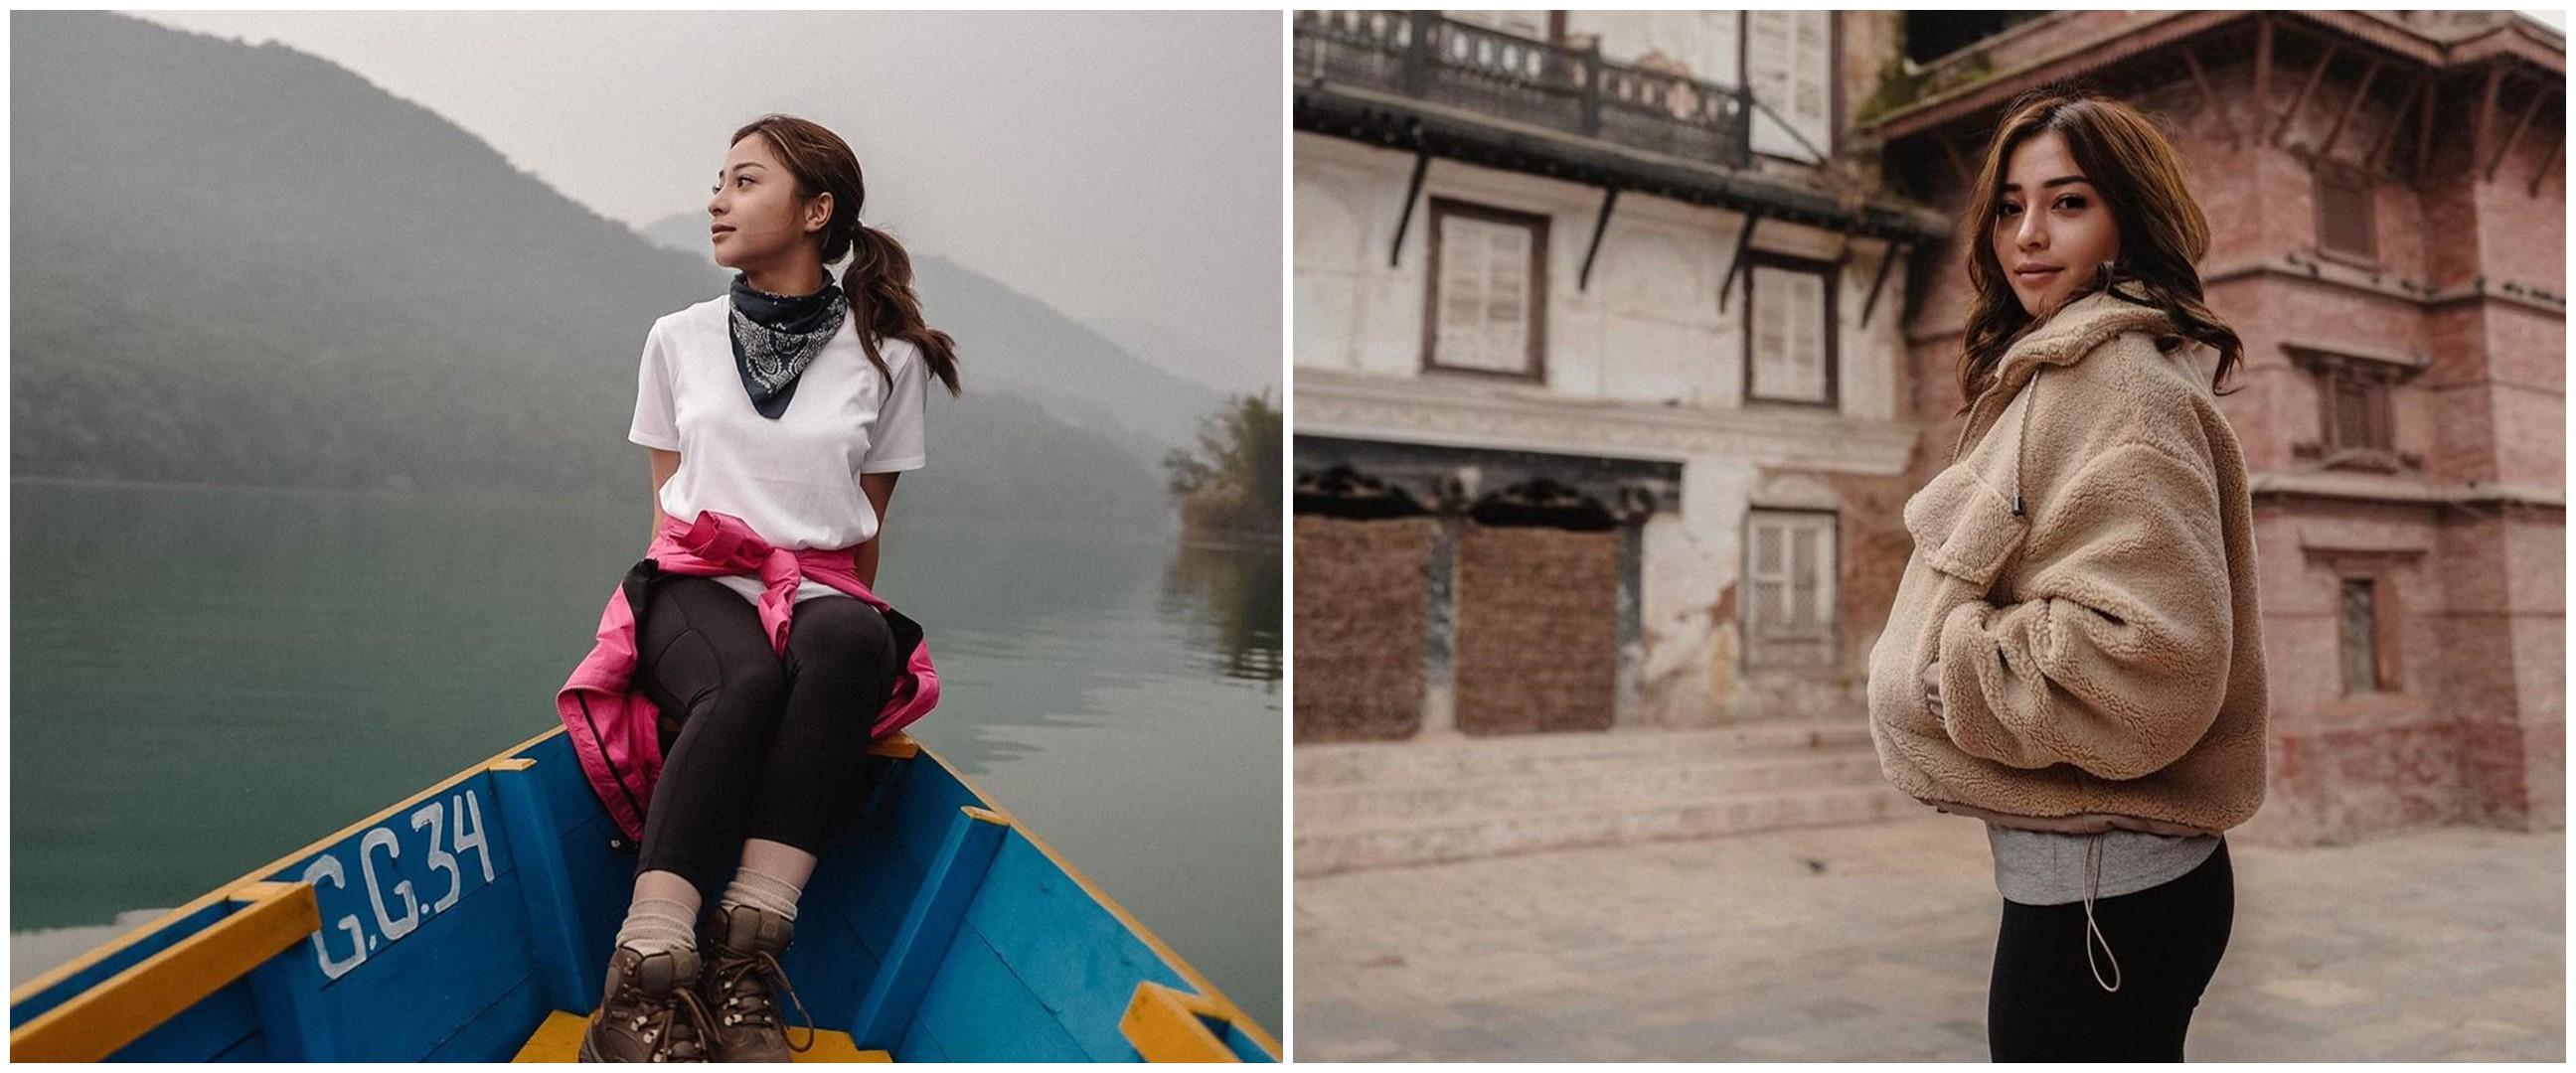 7 Gaya liburan backpacker Nikita Willy ke Nepal, tetap stylish